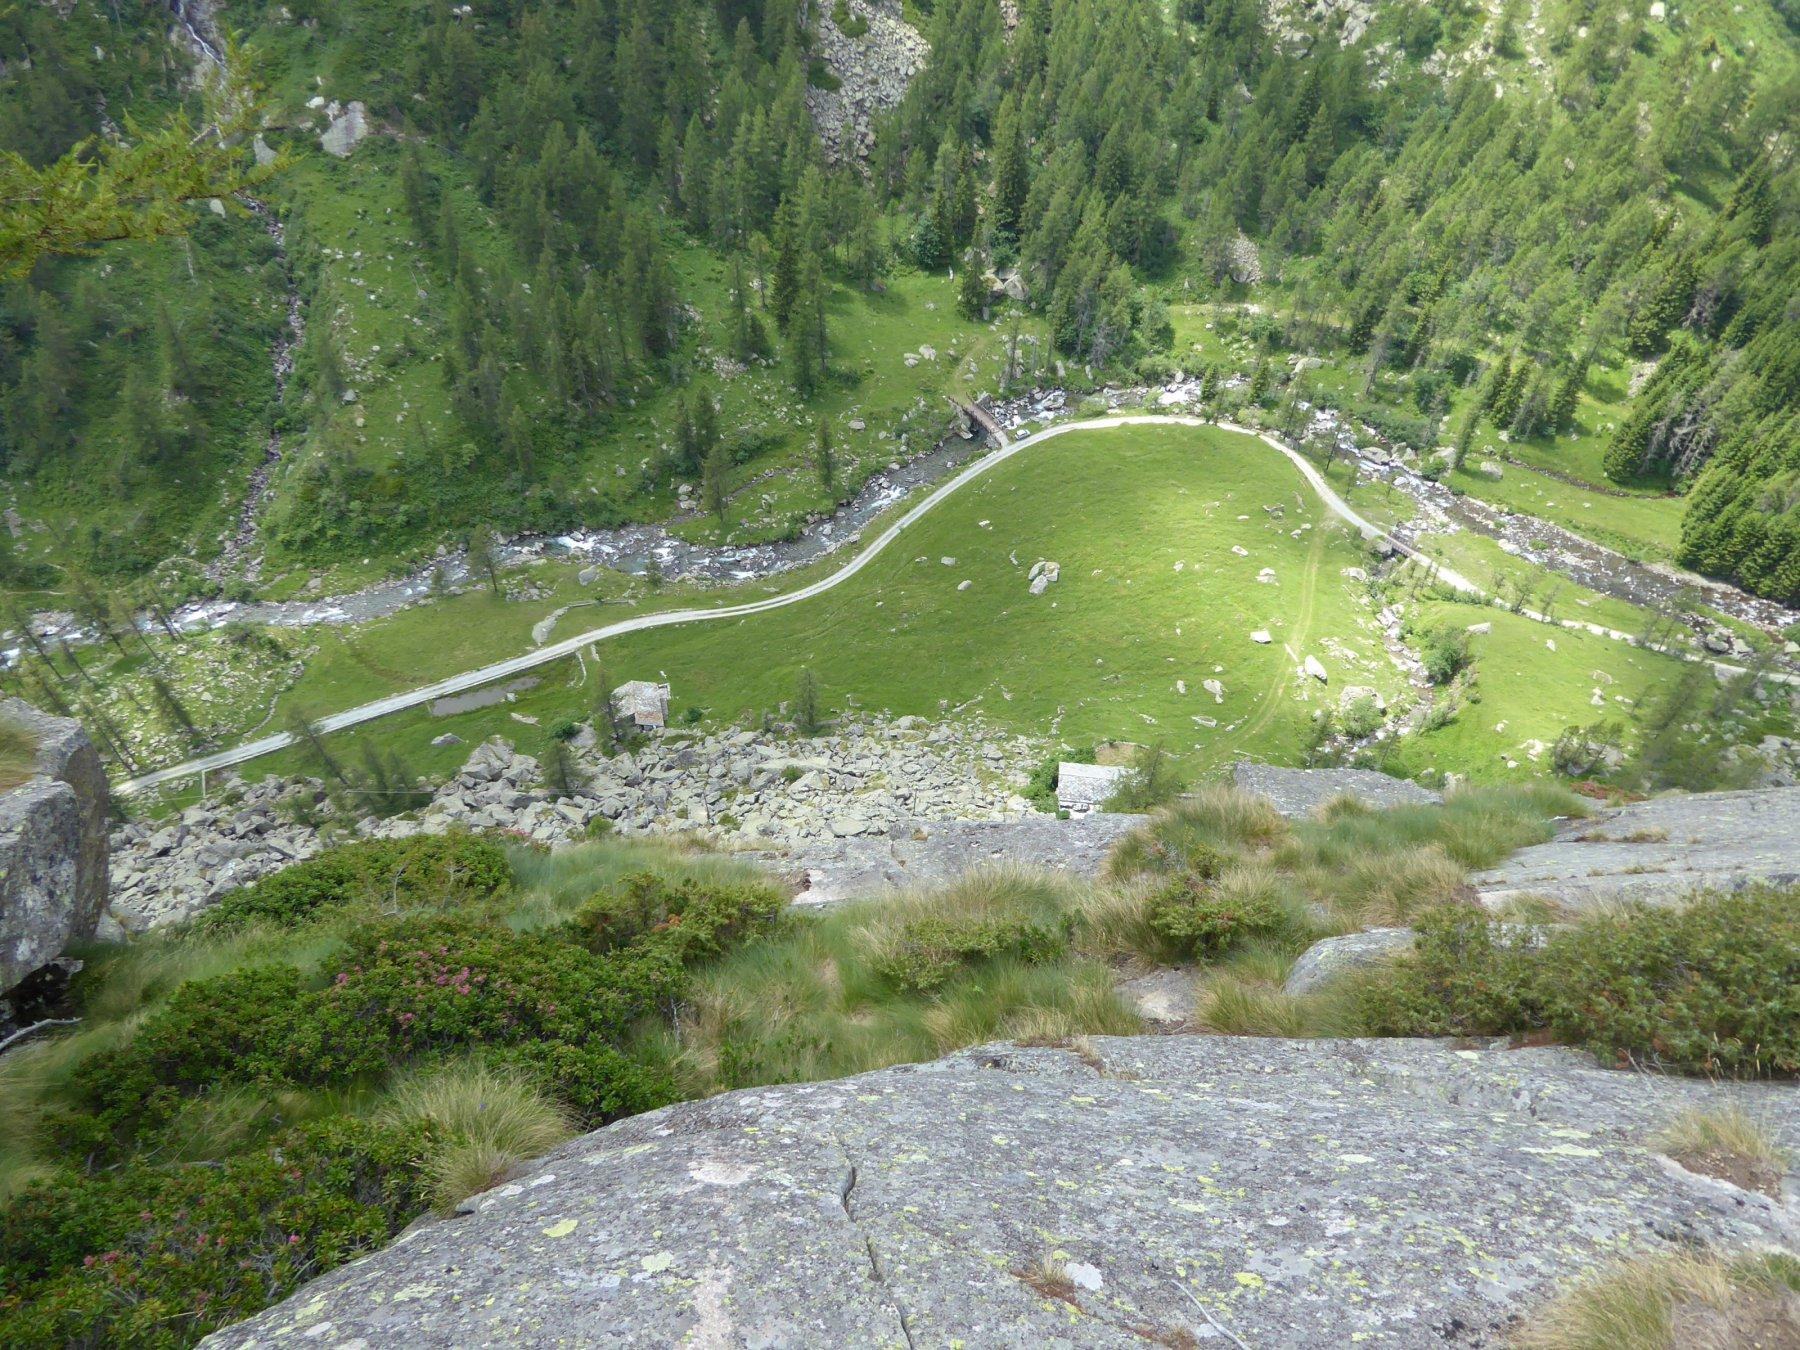 Veduta aerea dell'Alpe Randonero, dal Munt ad Runduner